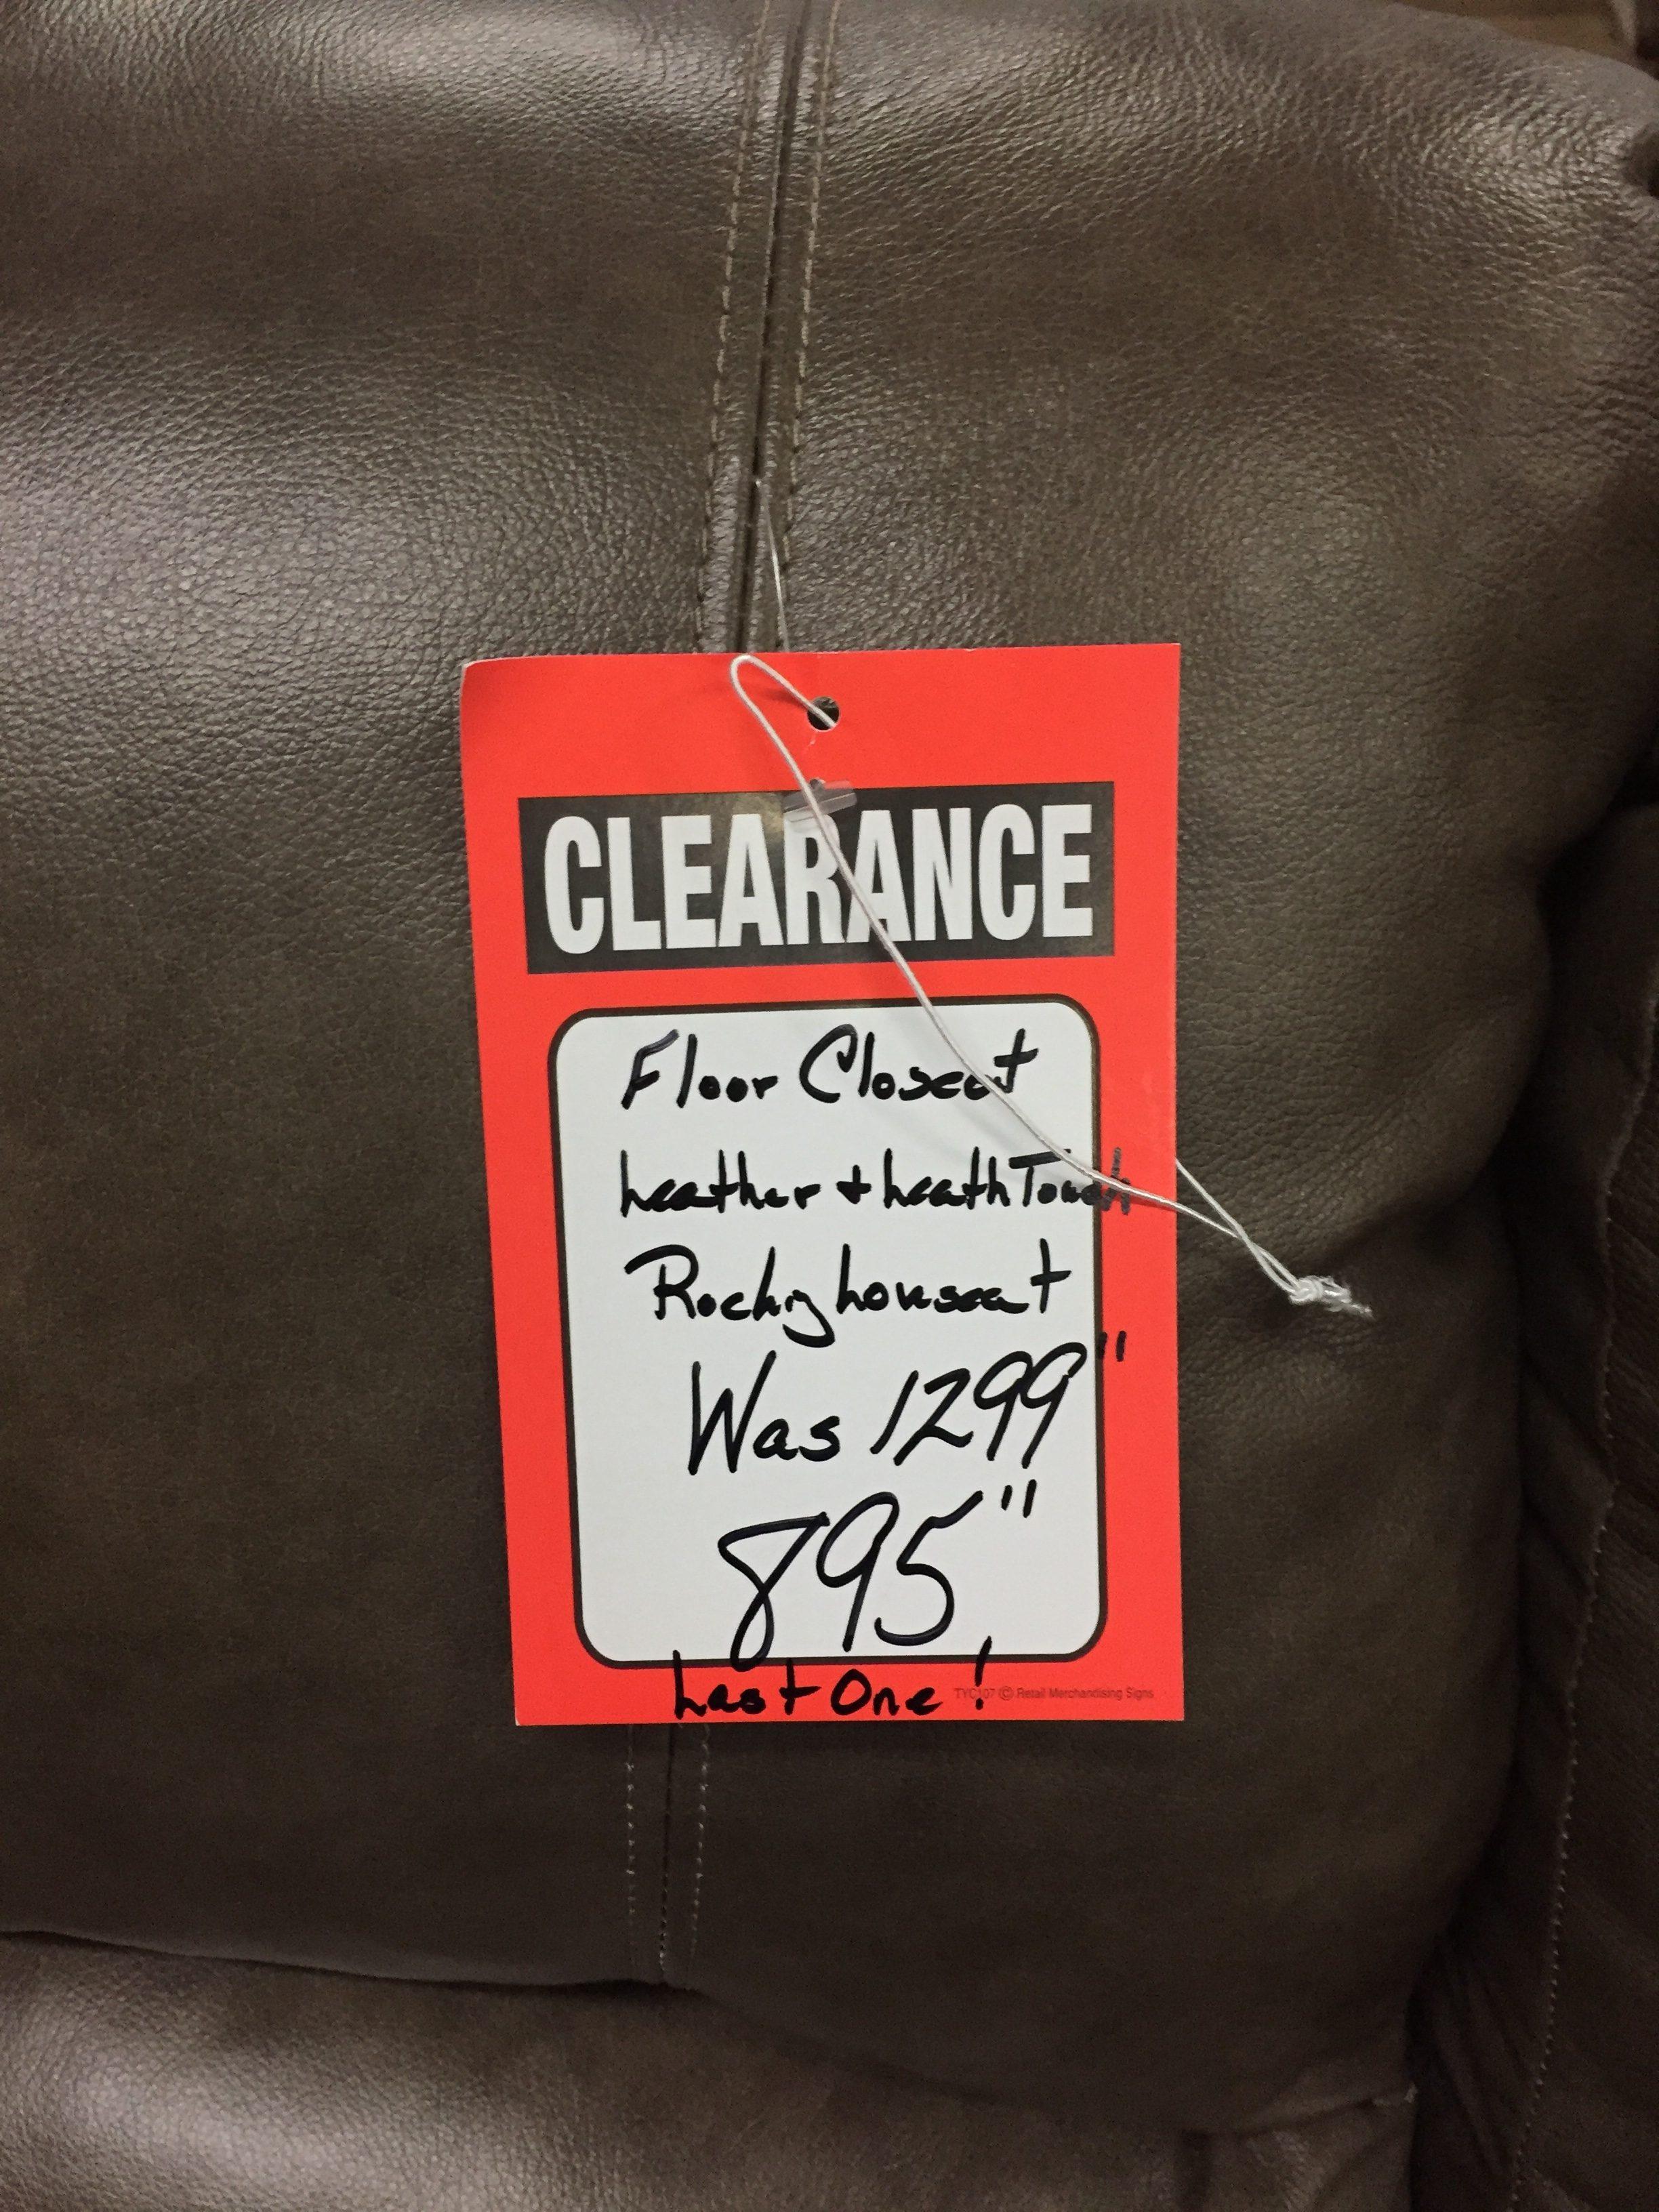 Clearance Jordan Furniture